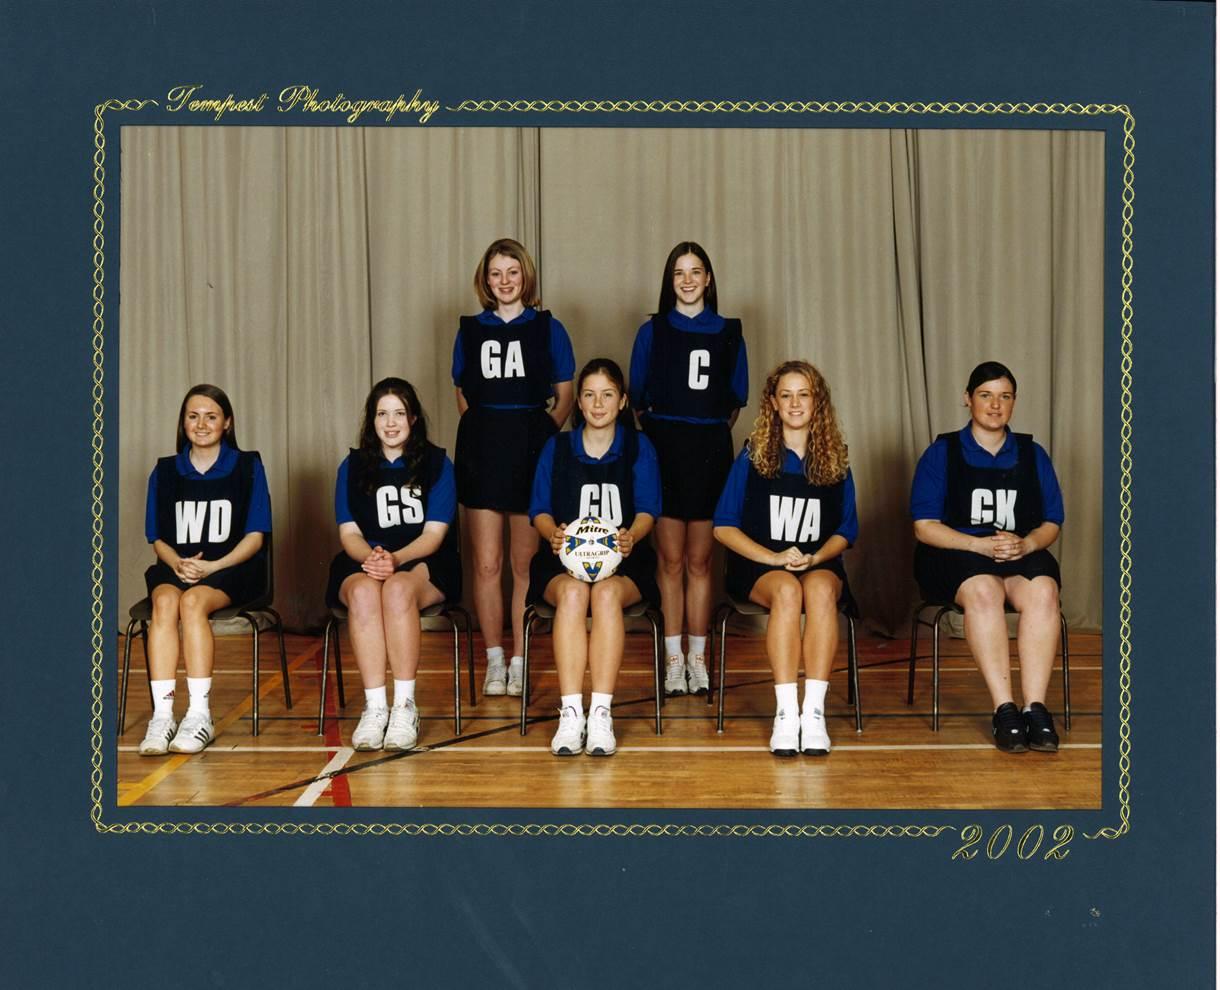 Girls Netball 2002